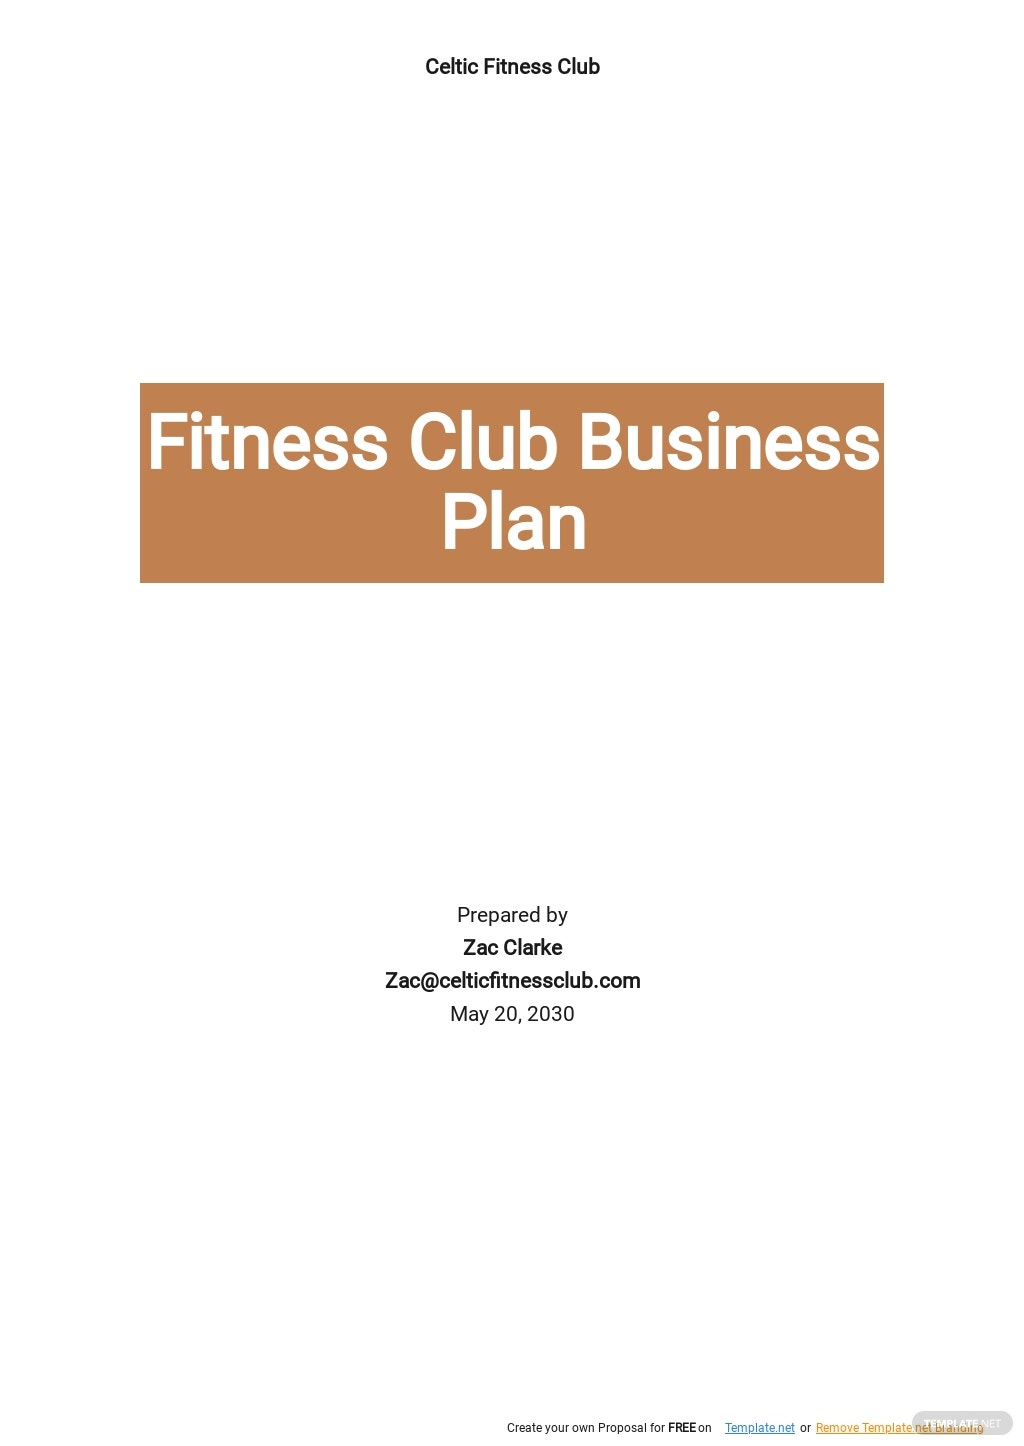 Fitness Club Business Plan Template.jpe